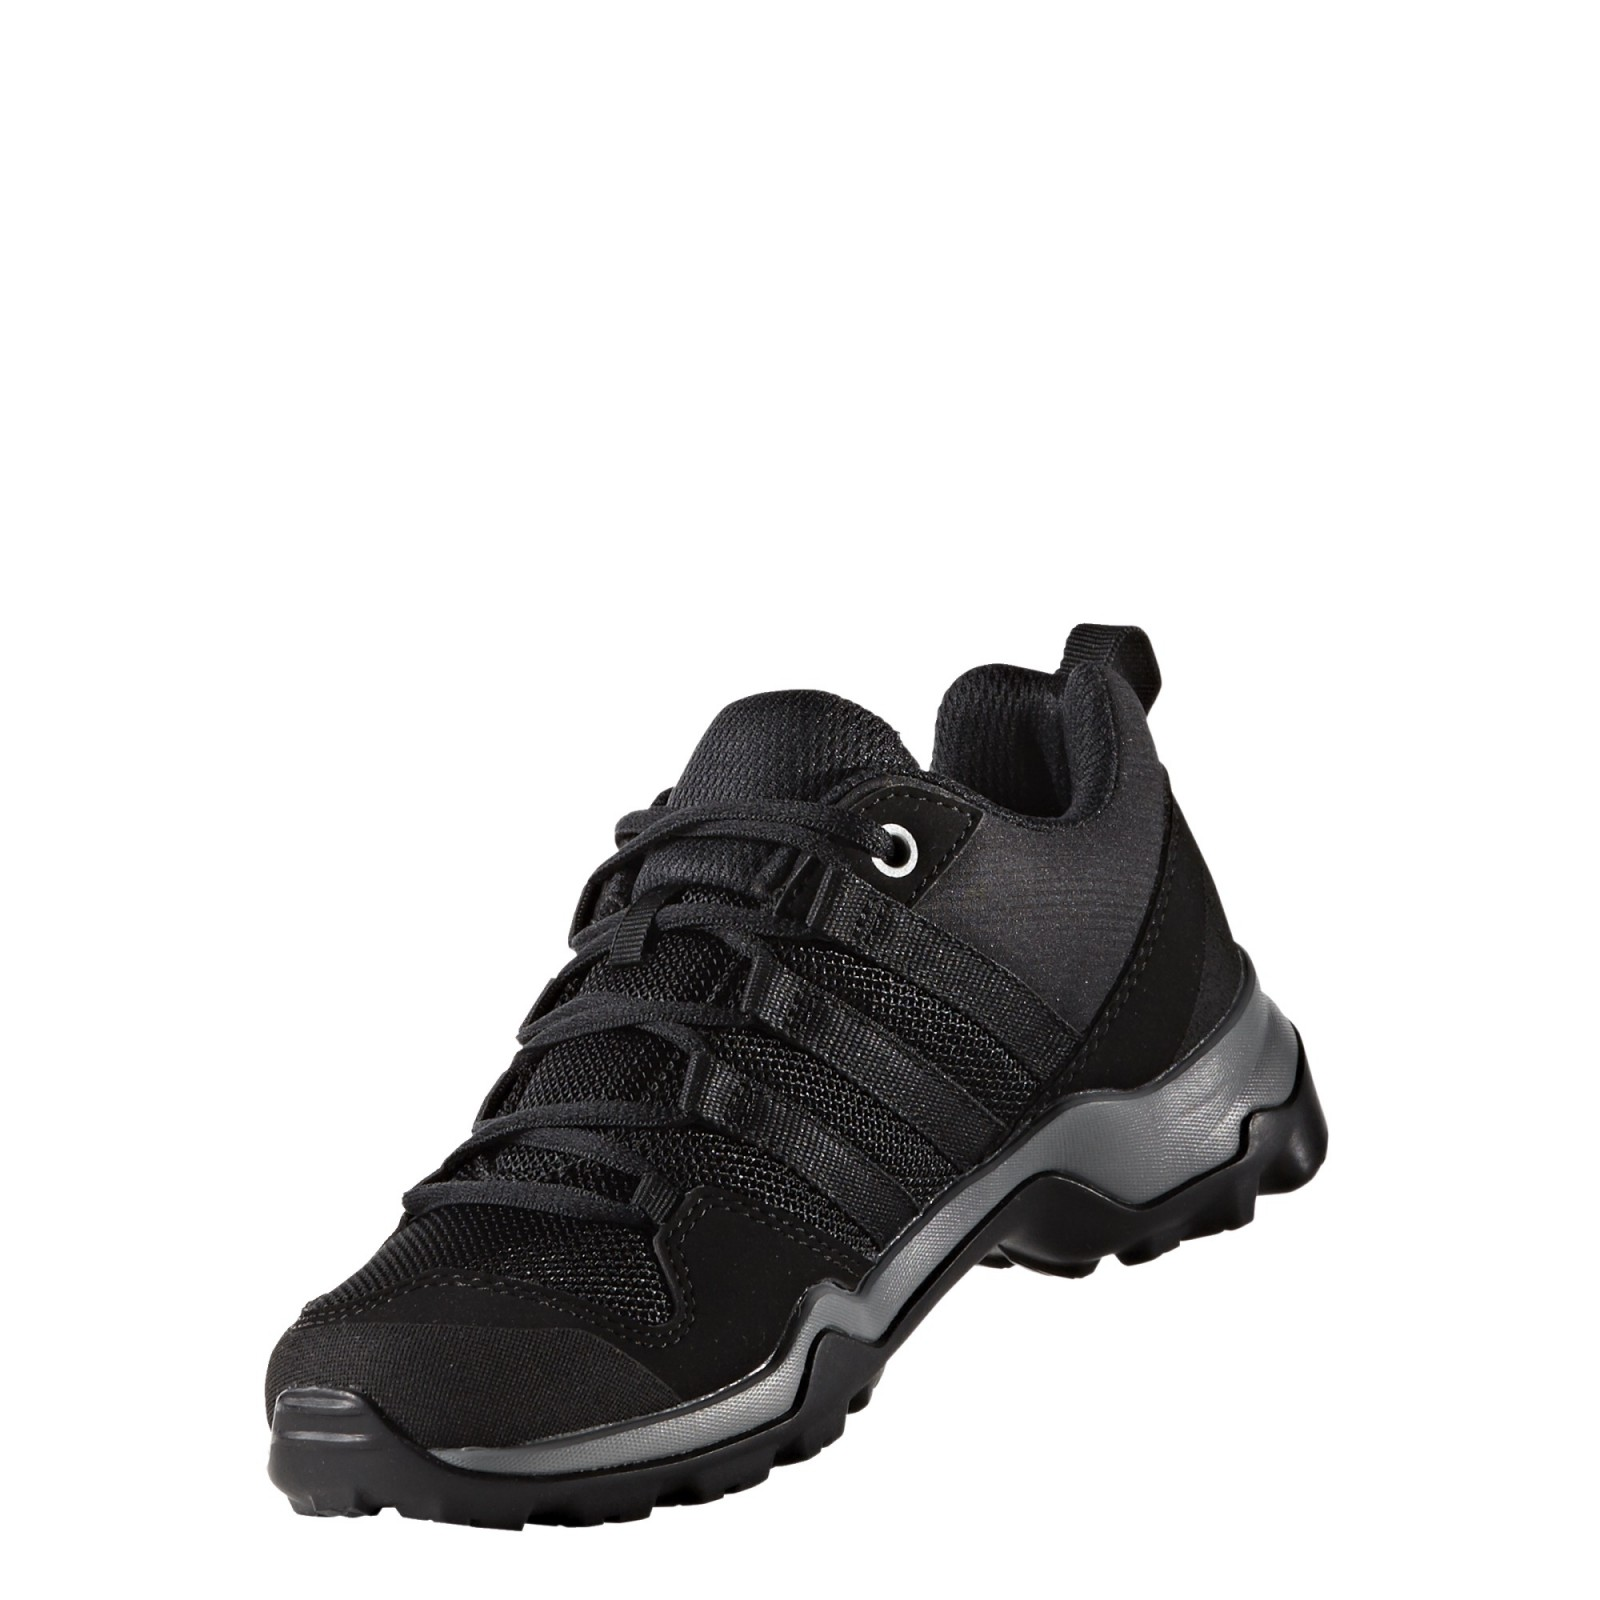 Dětská treková obuv adidas TERREX AX2R K  1ae28ac4b3b